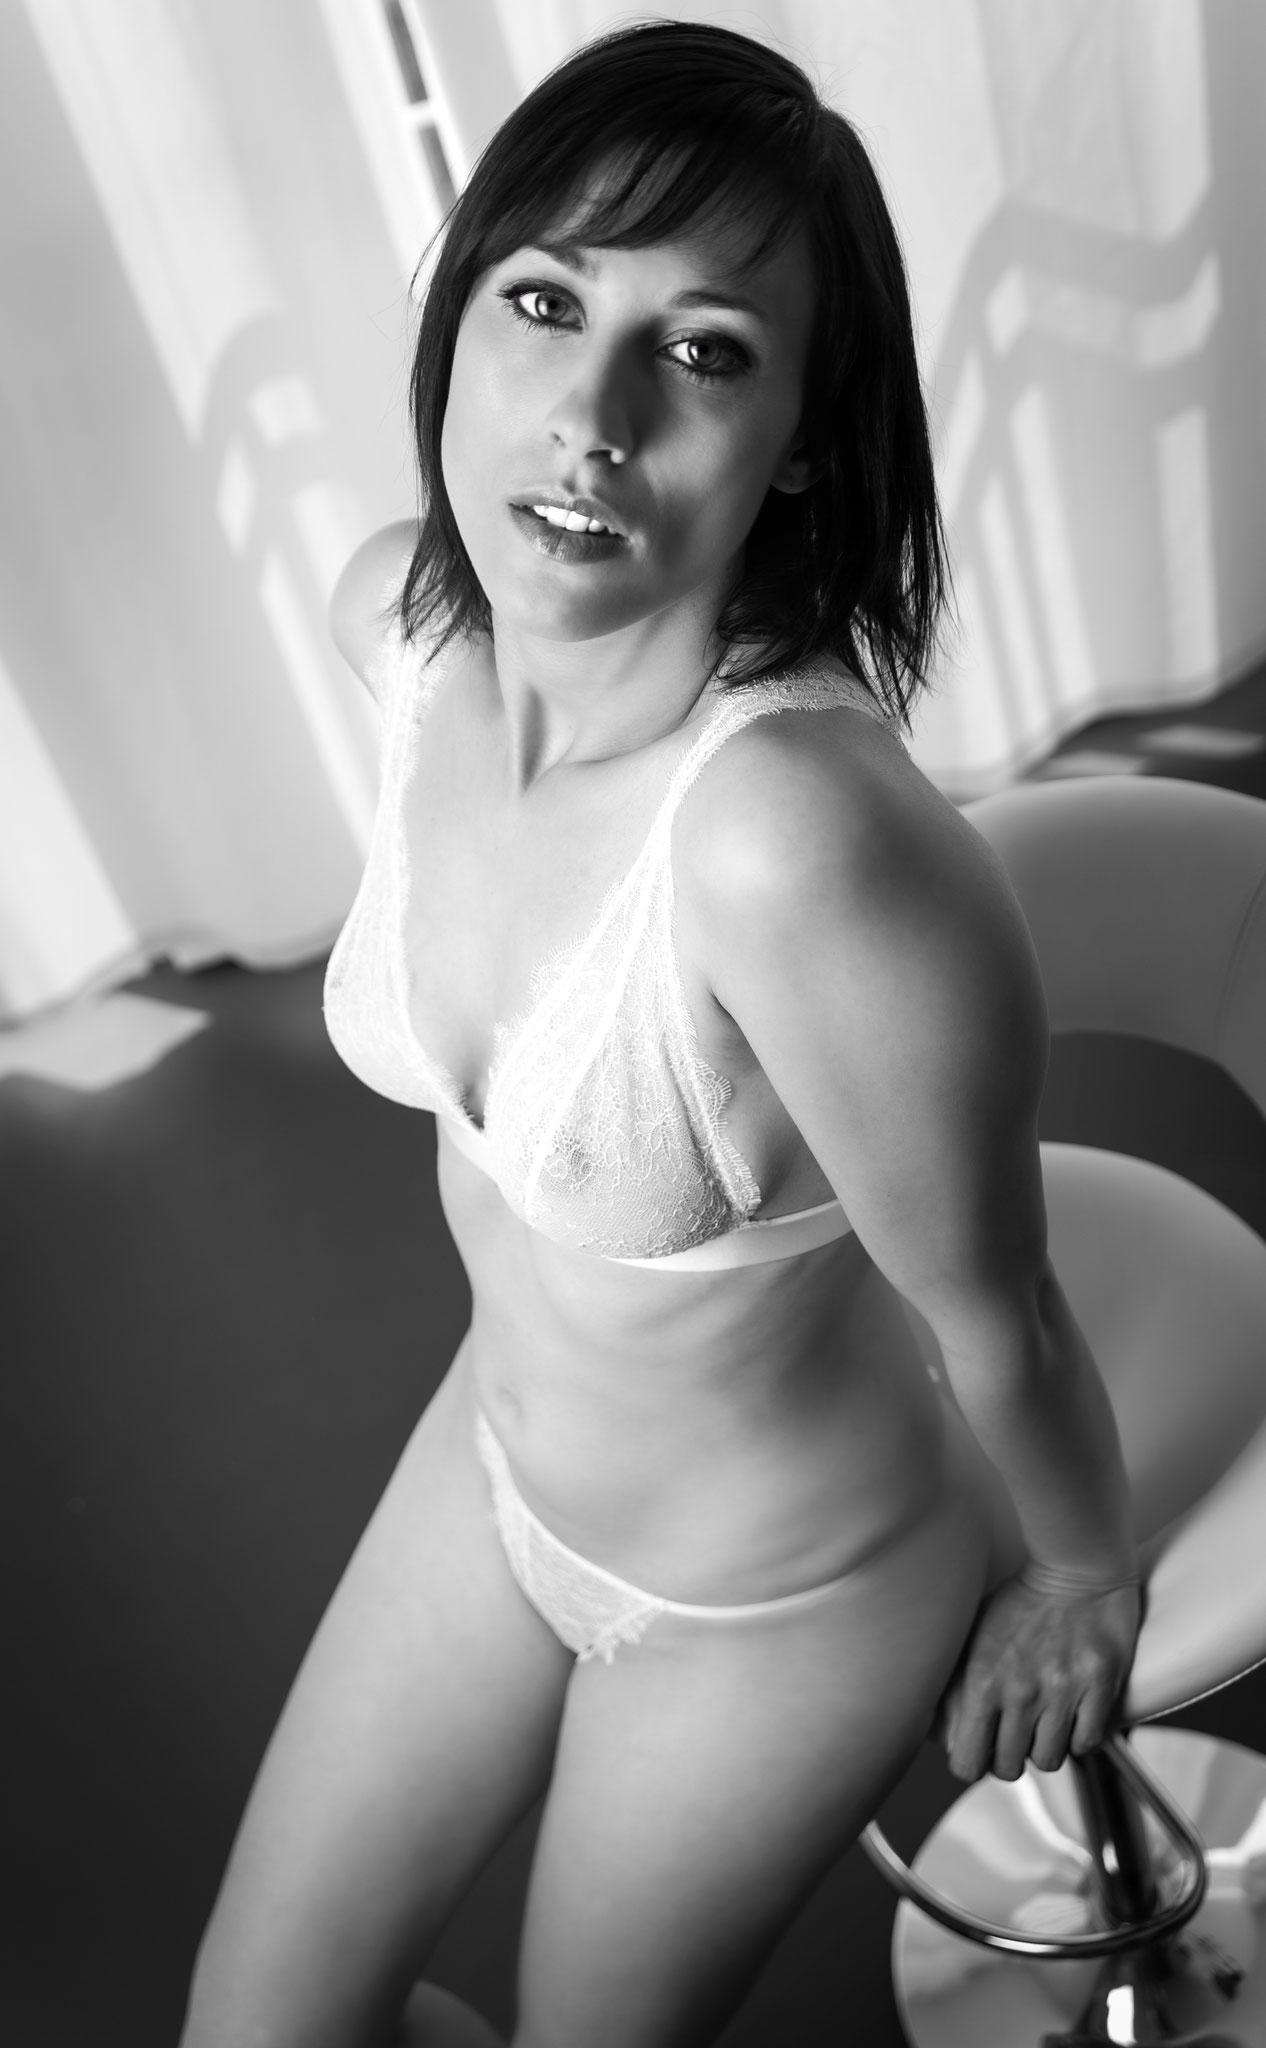 Sexy Lingerie Photoshoot von Kundin die Erotic Fotoshooting im Atelier Erlangen gebucht hat - Sexy Shootings